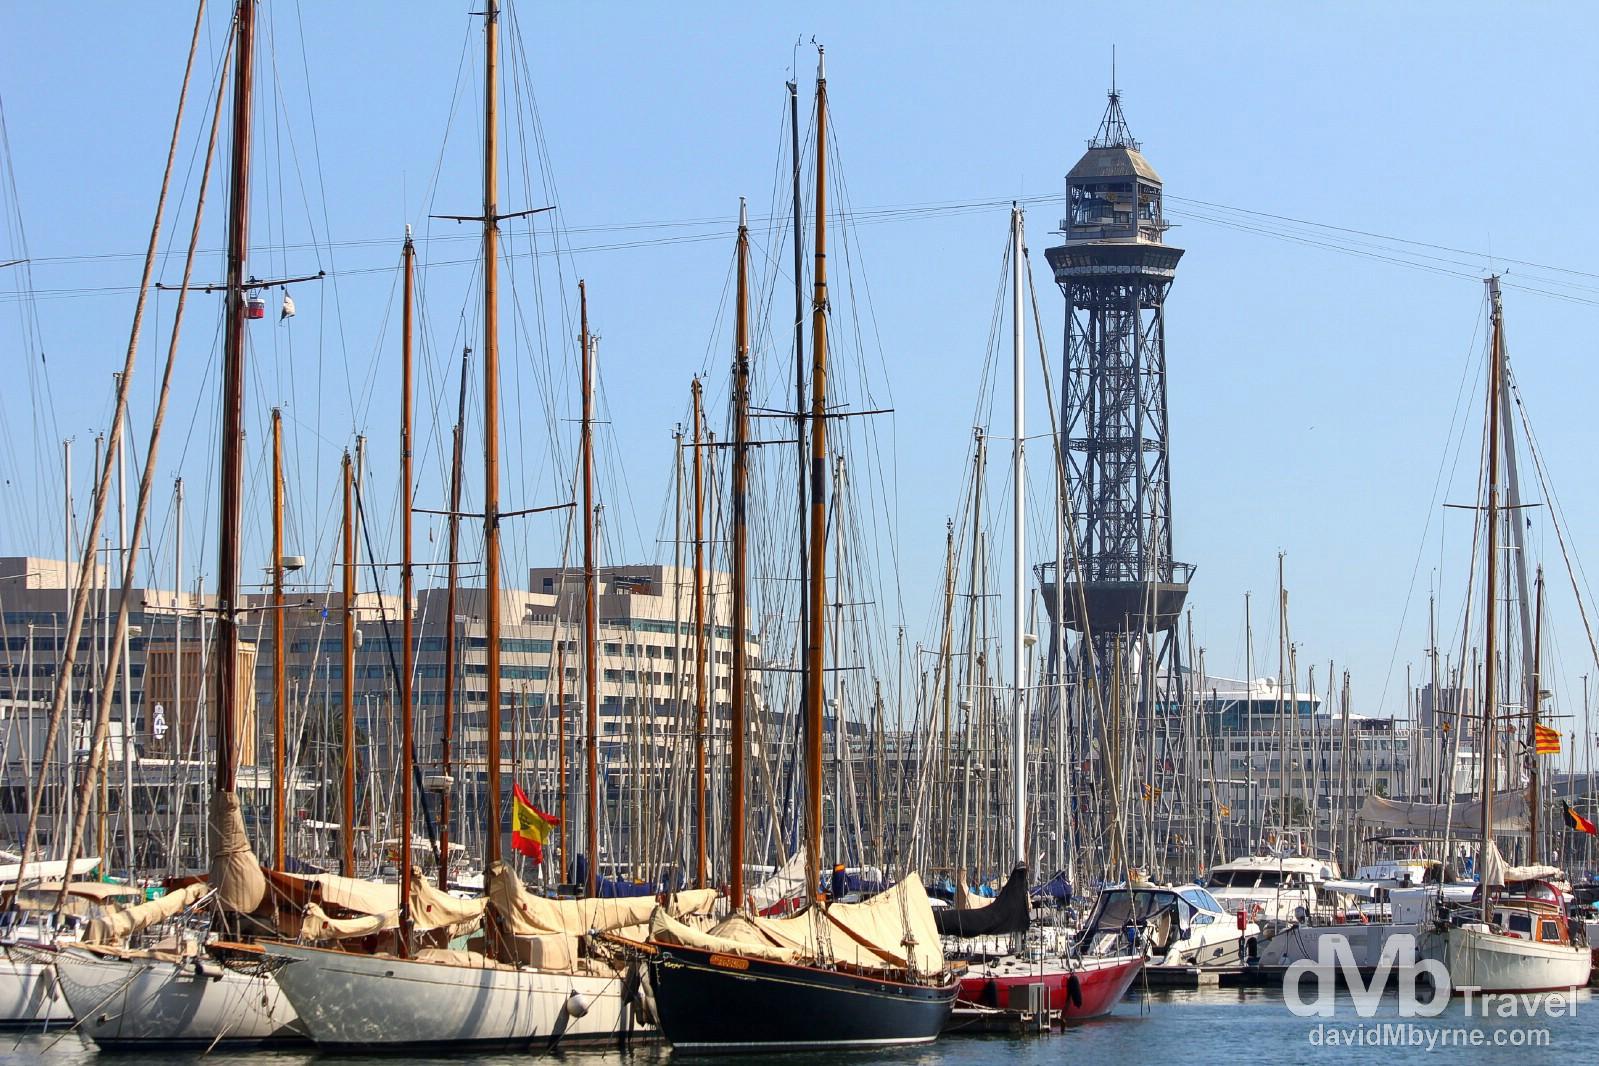 Port de Barcelona, Barcelona, Spain. June 16th, 2014.